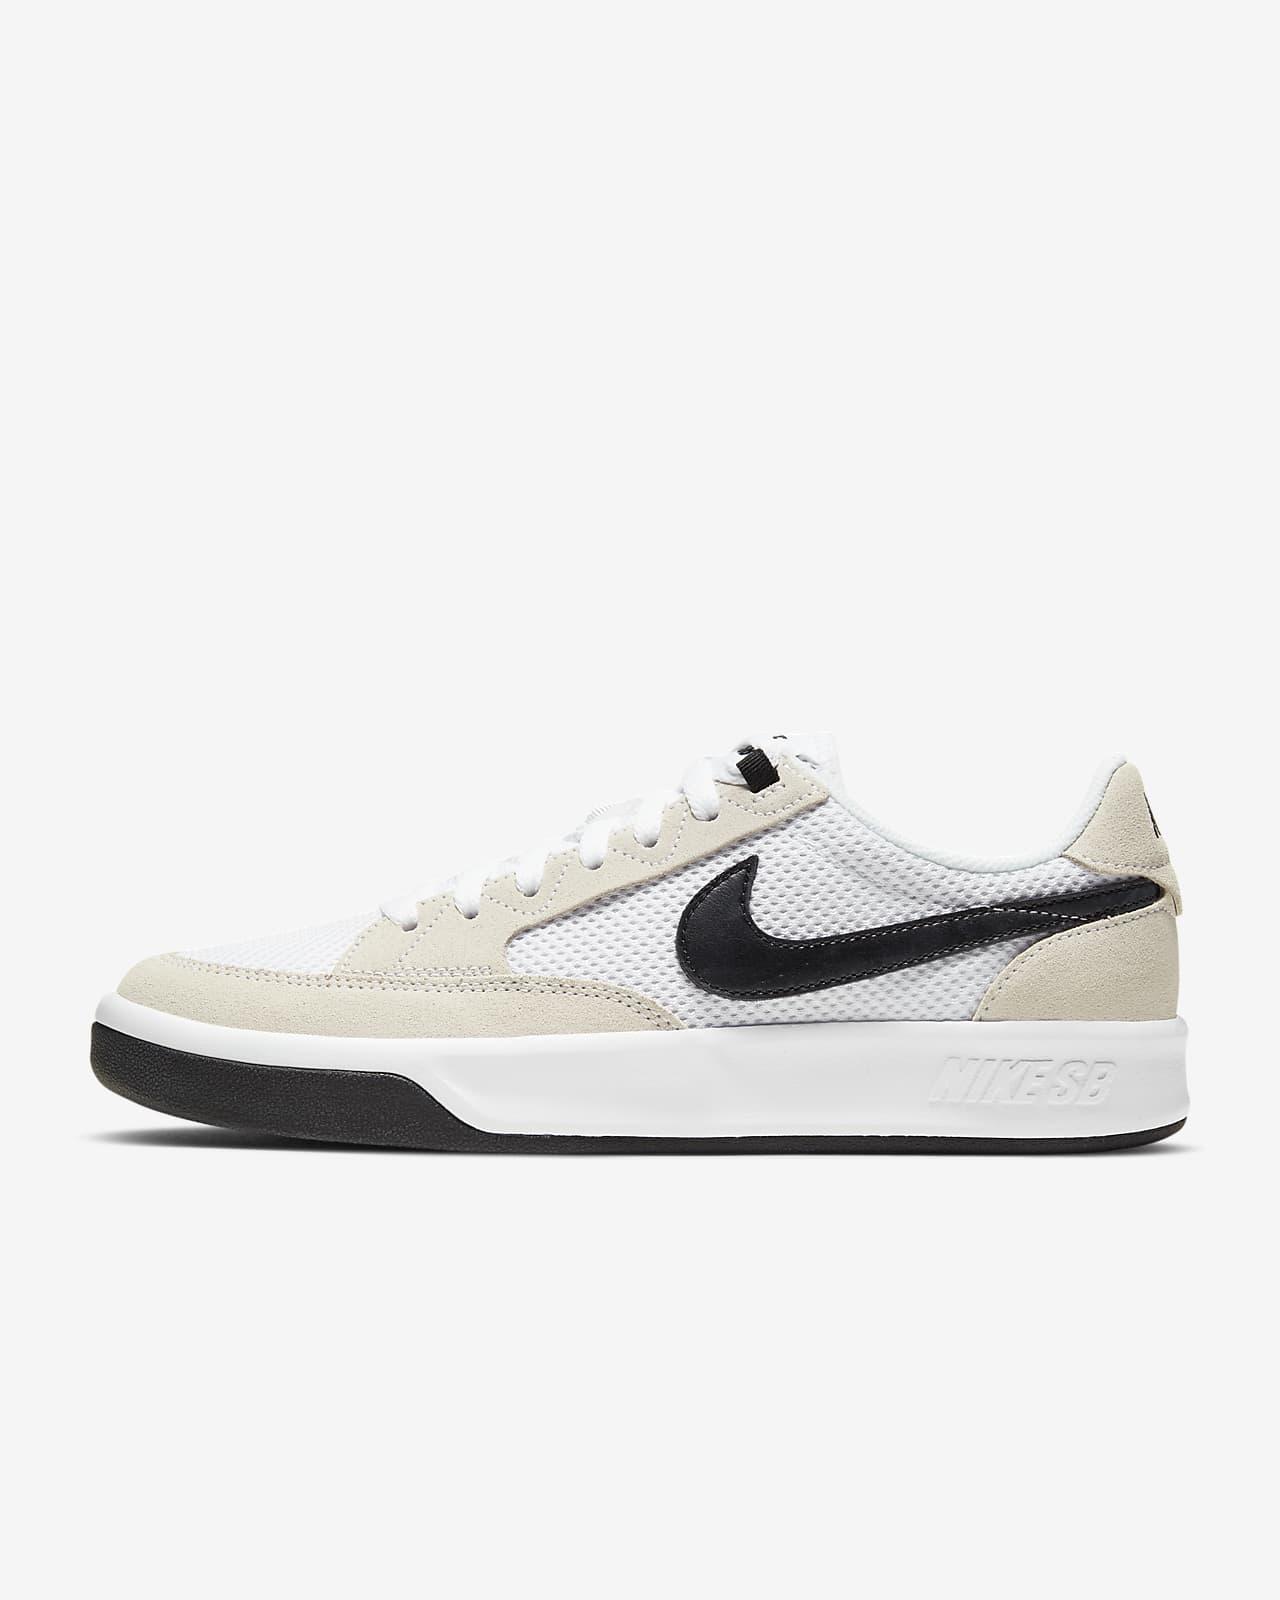 Nike SB Adversary Skate Shoe